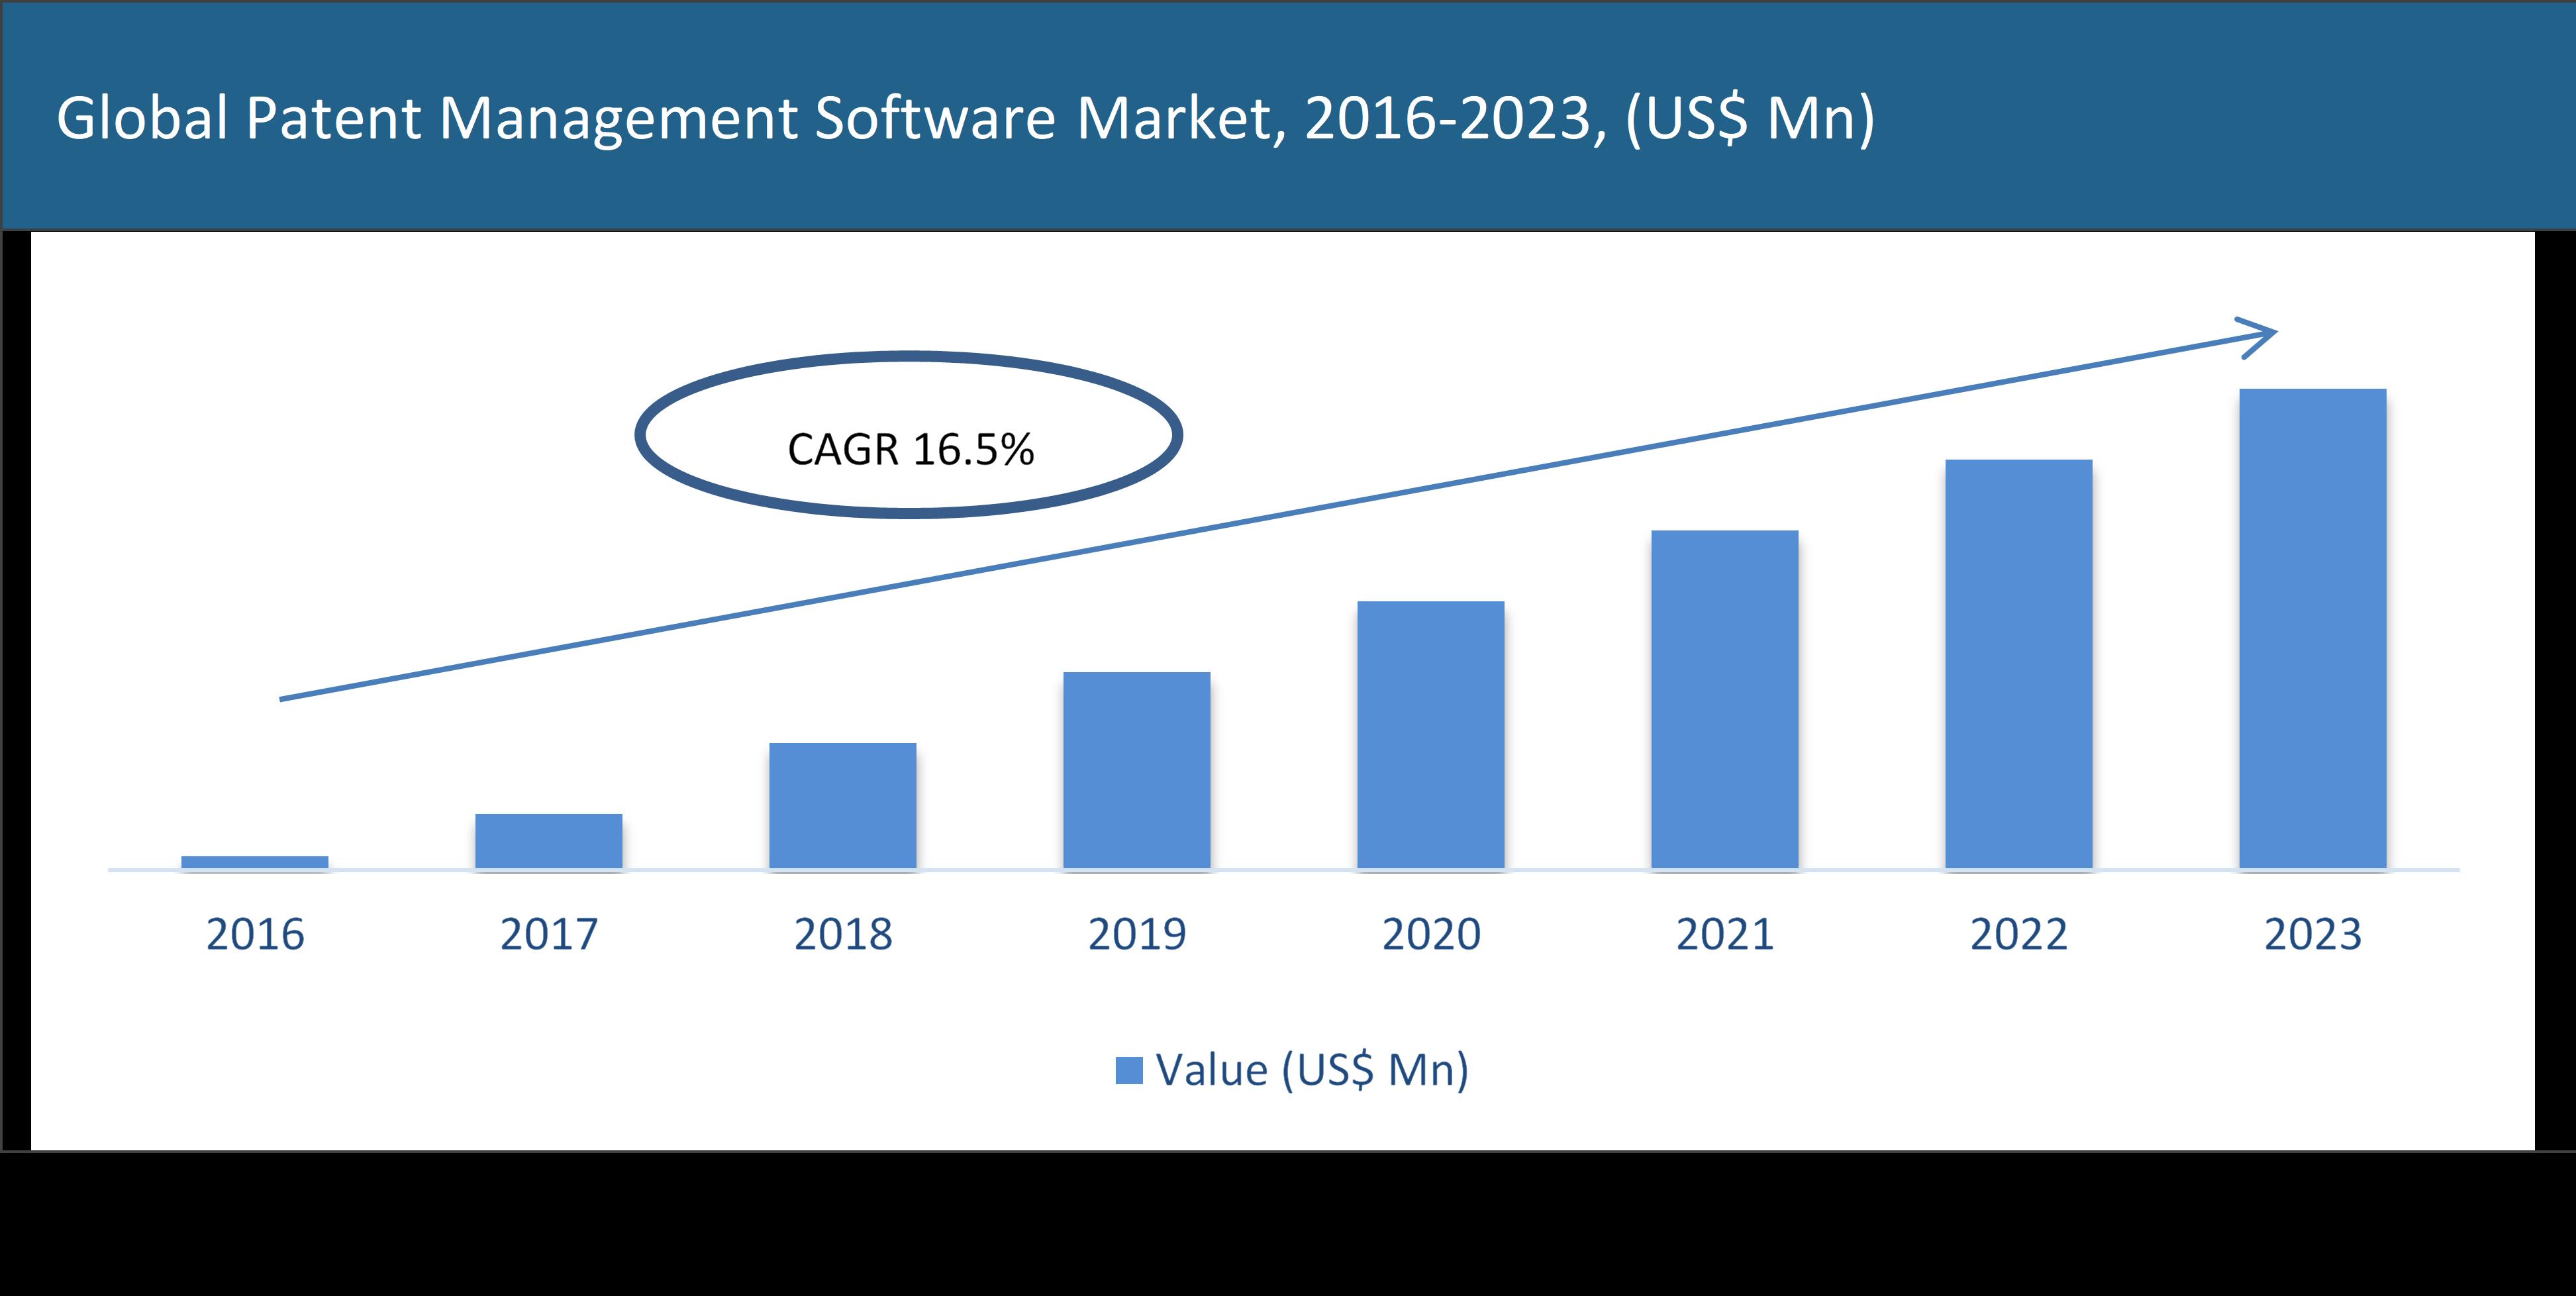 Global Patent Management Software Market